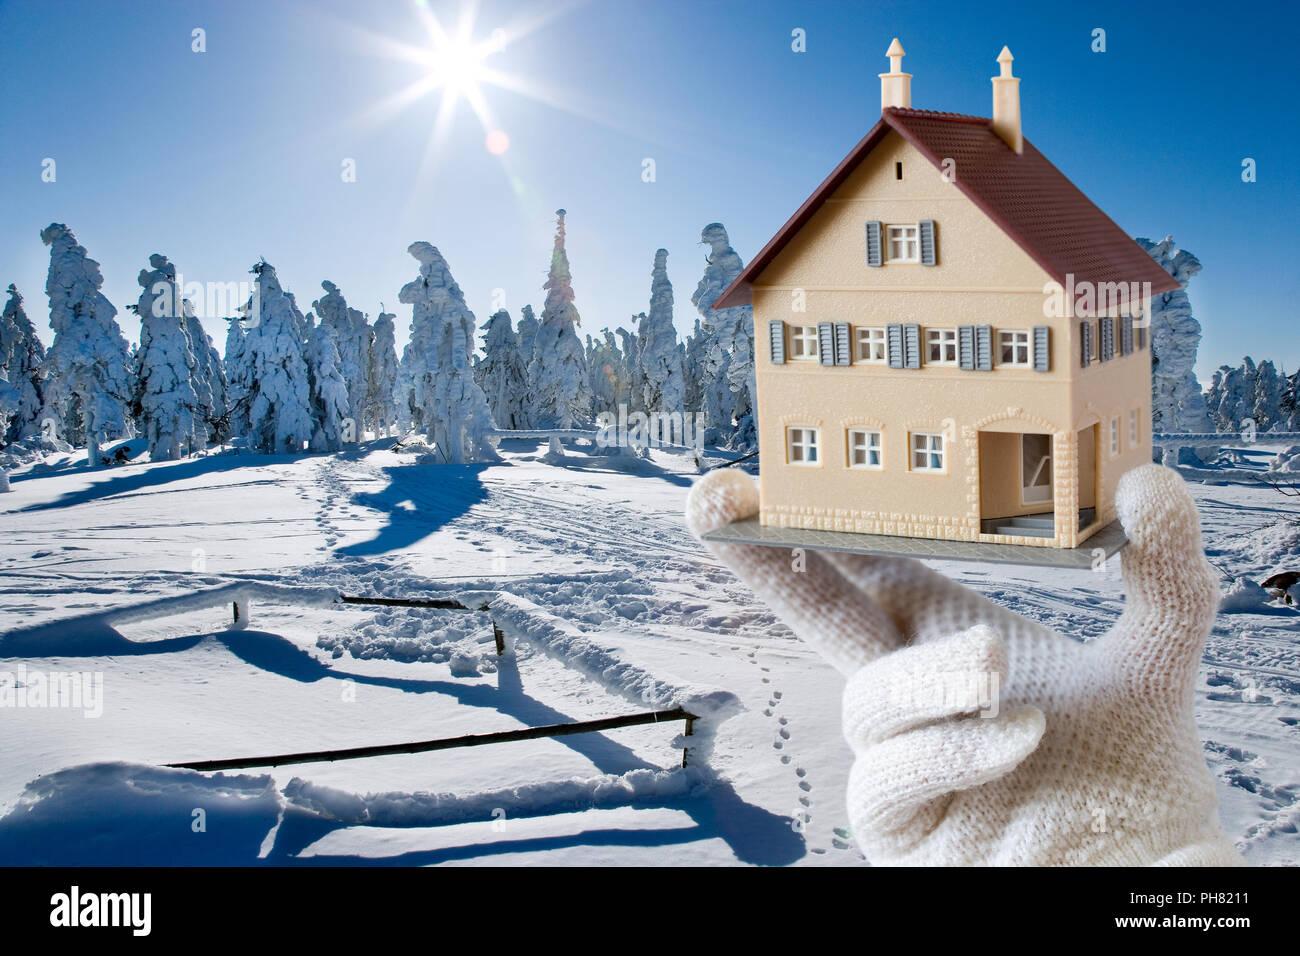 isolation maison hiver